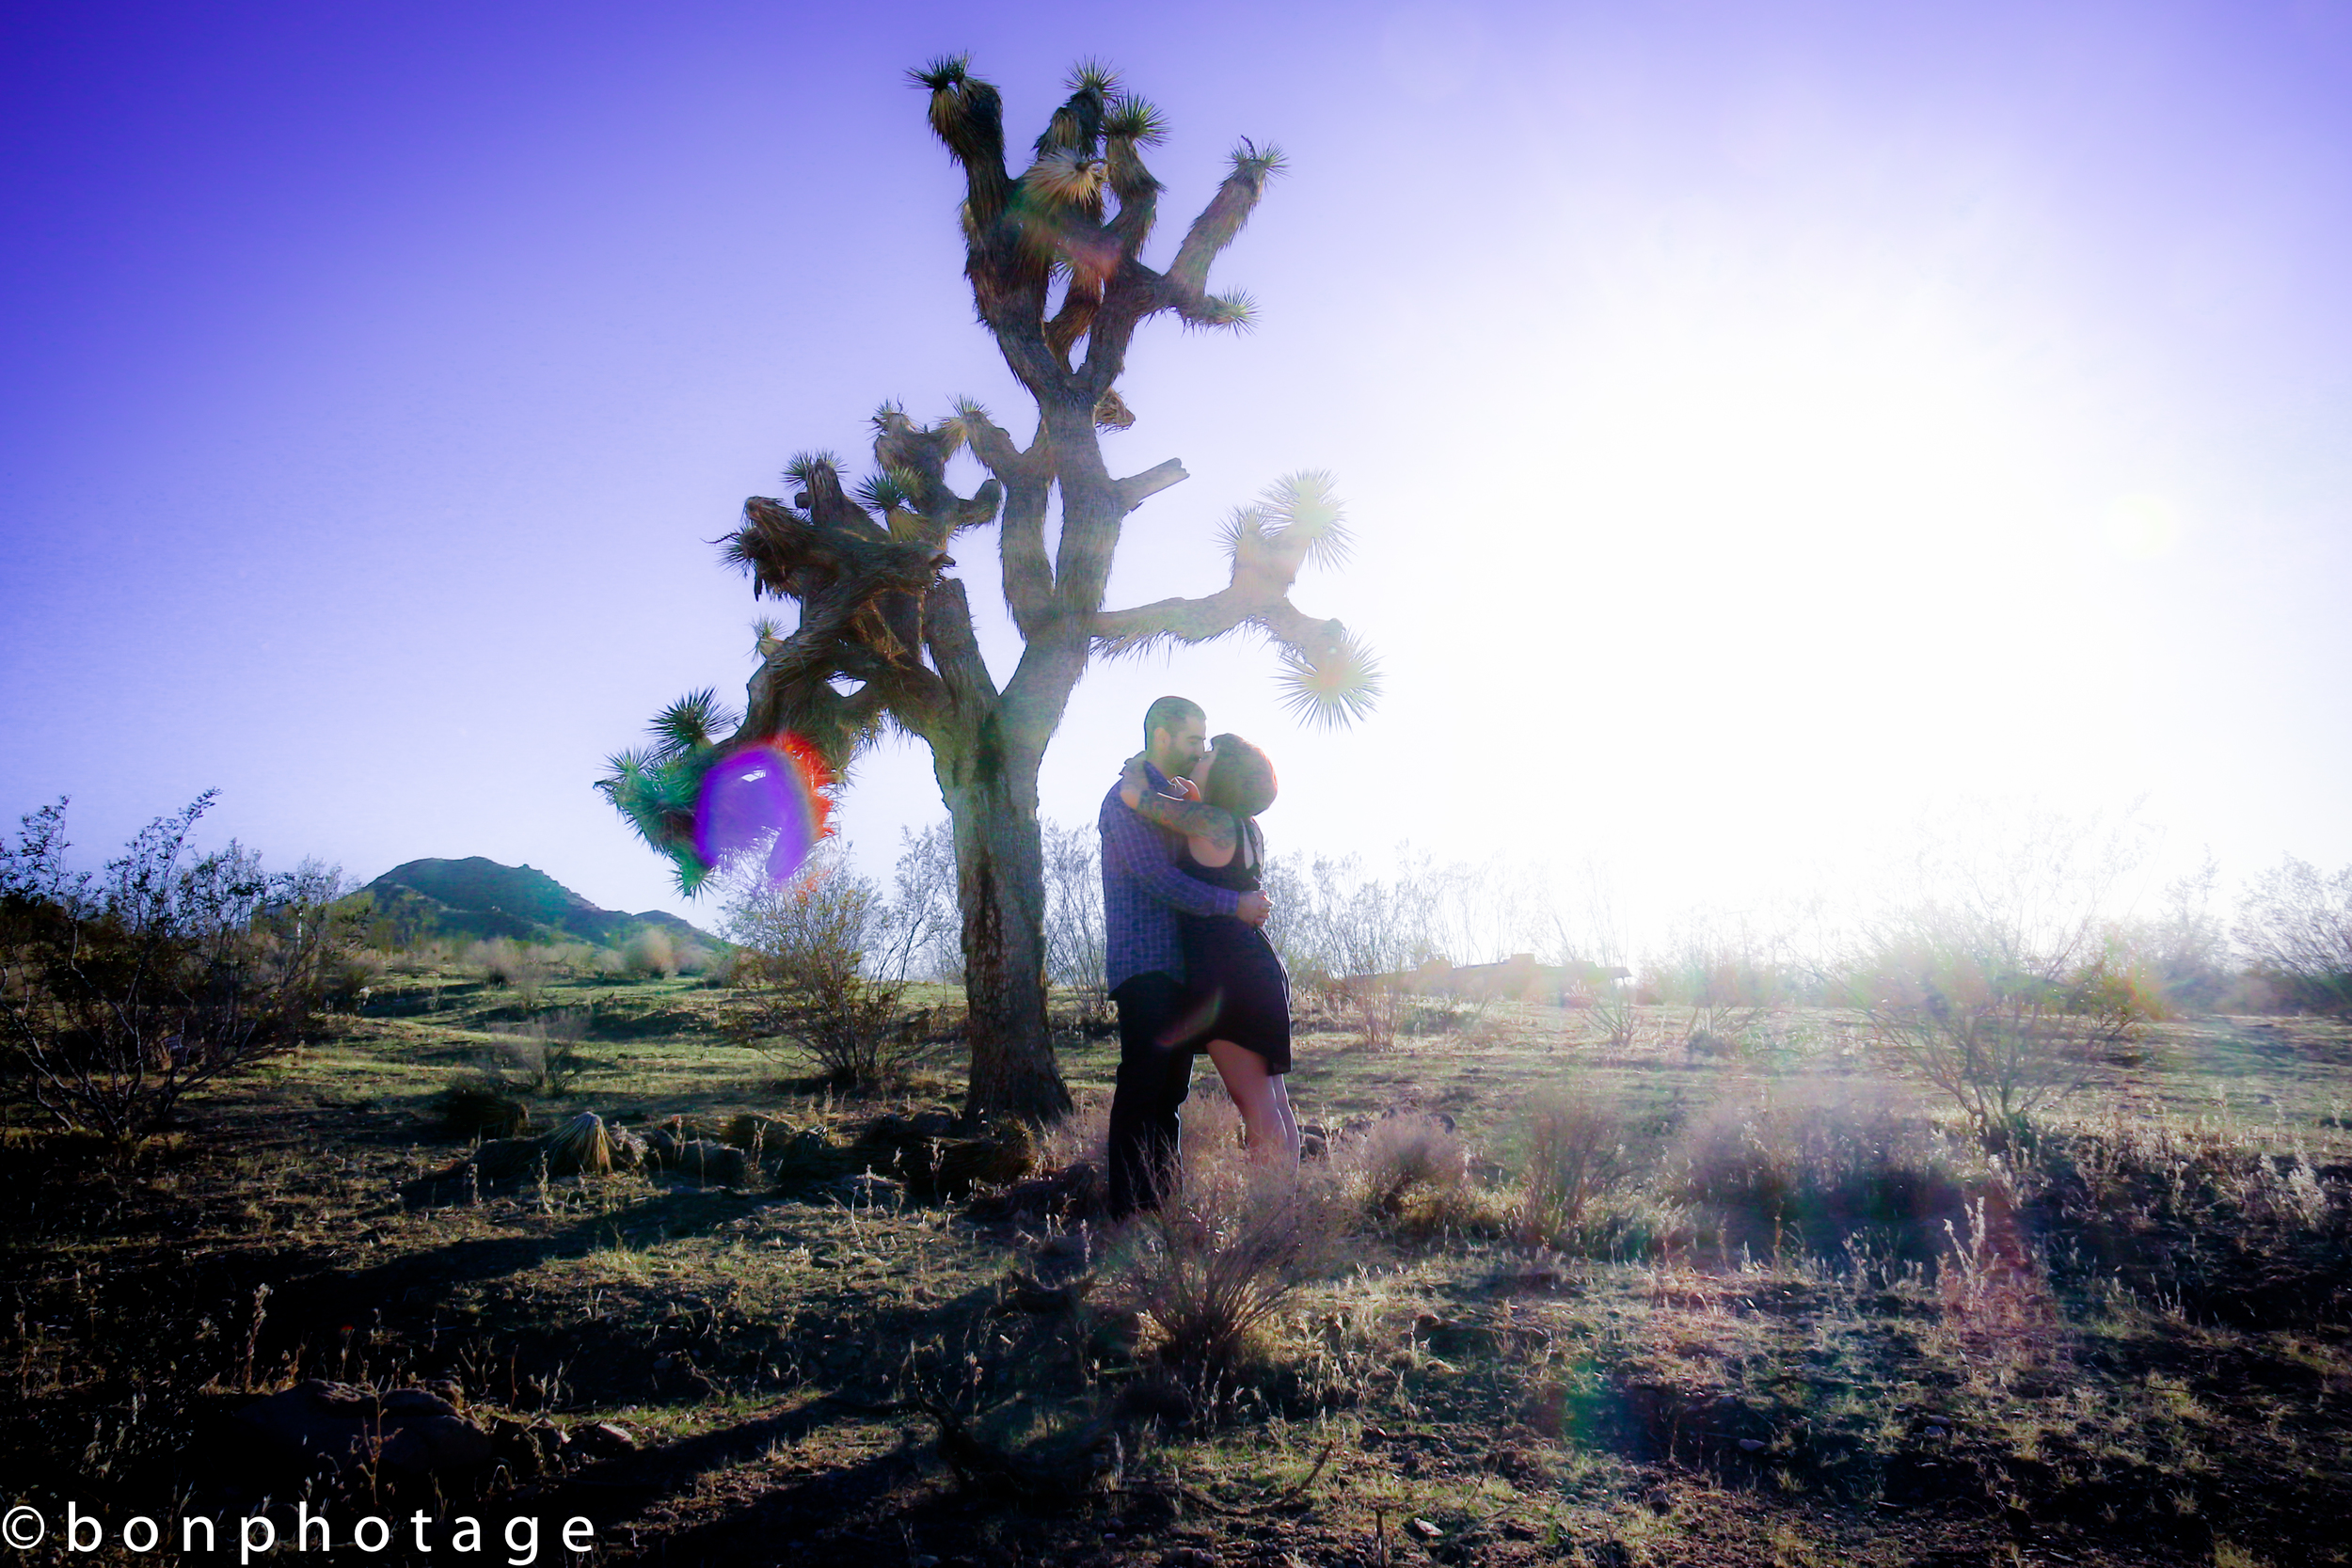 Desert vintage engagement photography by Bonphotage